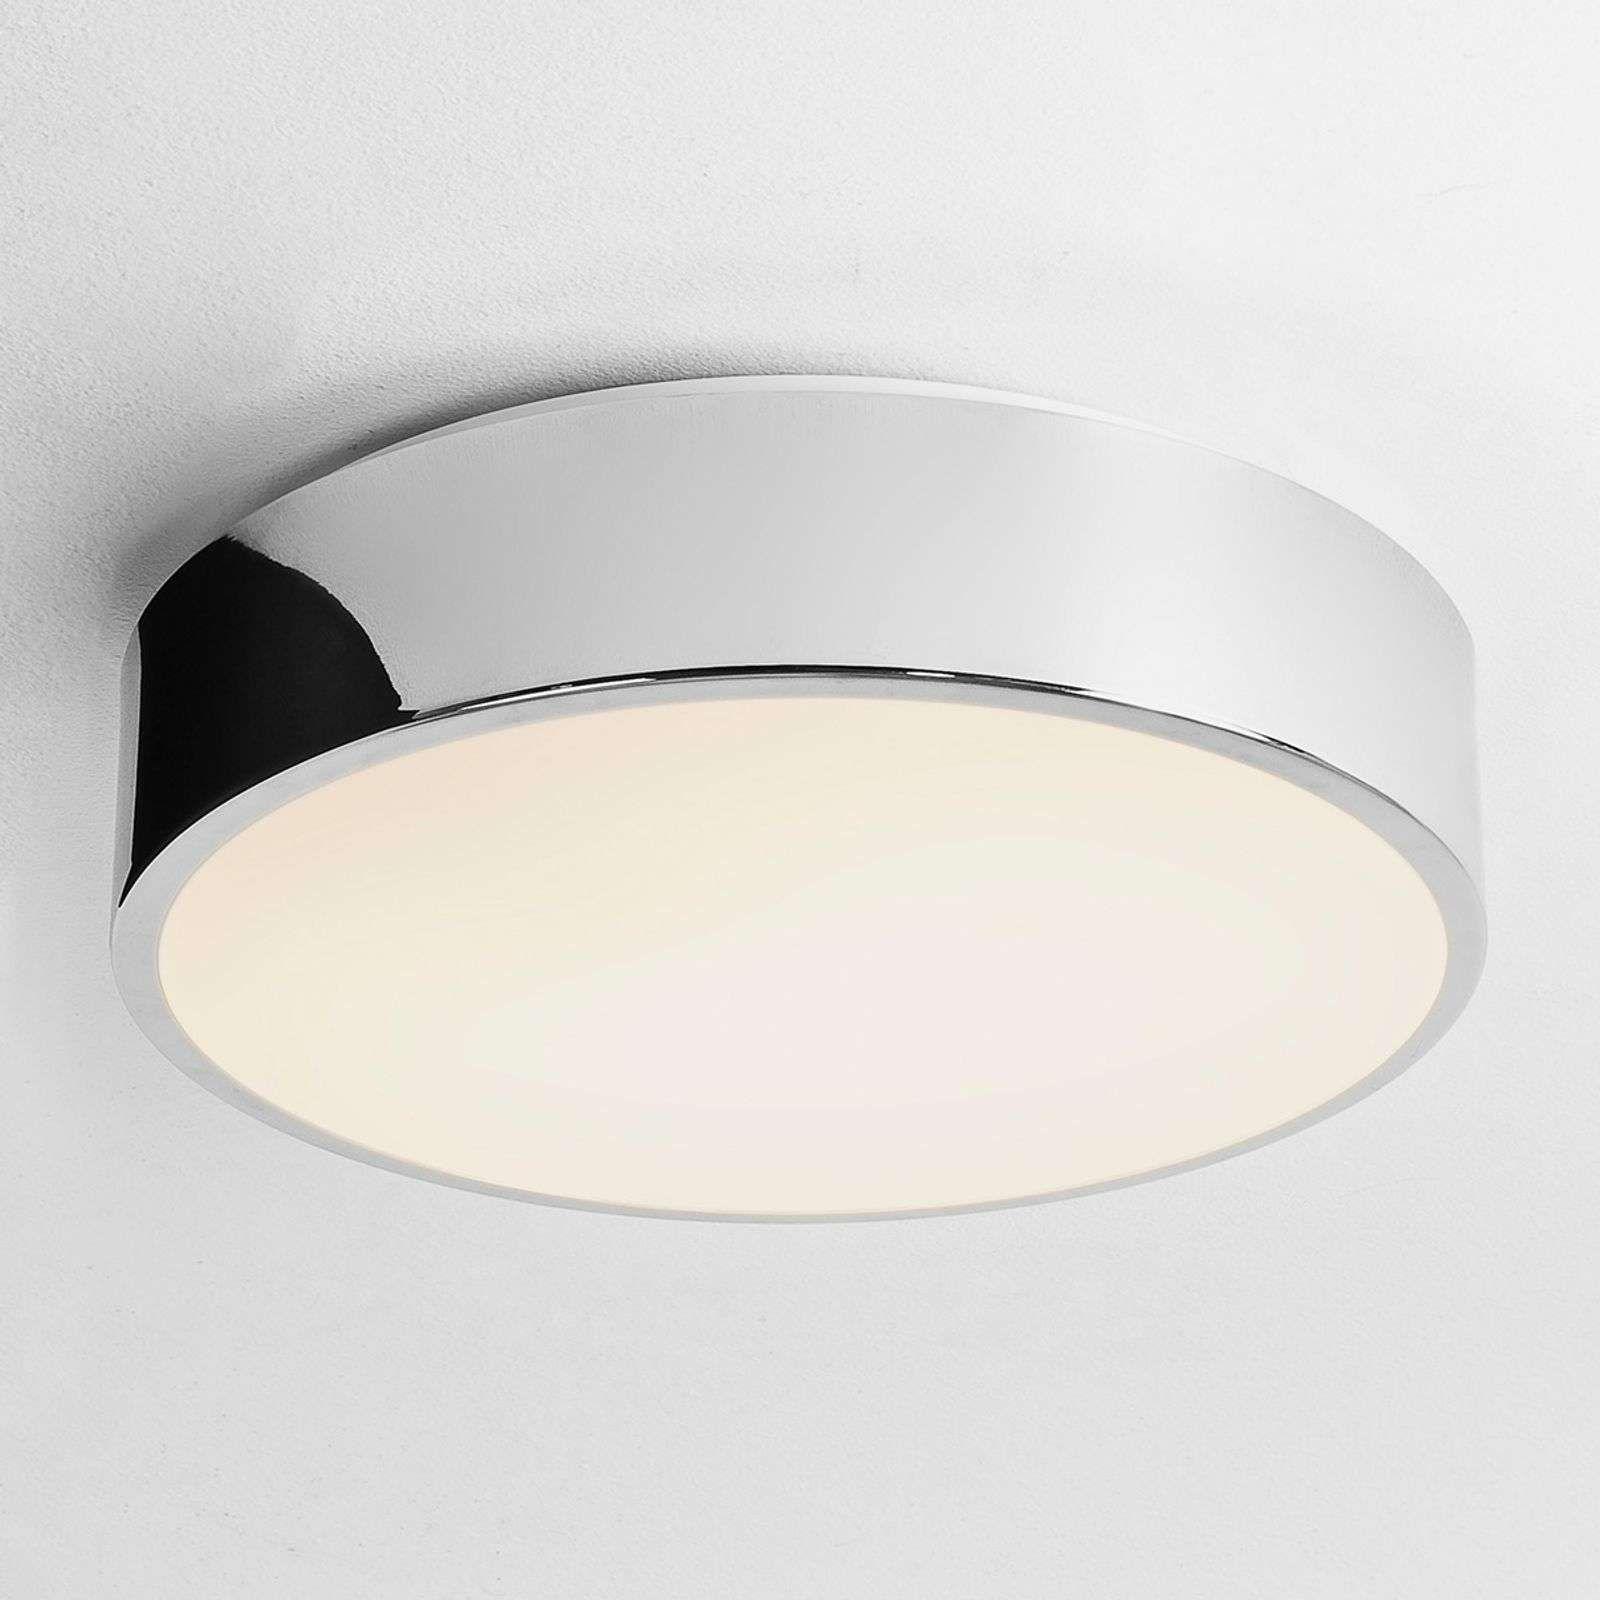 Indirekte Deckenbeleuchtung Badezimmer Esszimmer Lampe Led Modern Led Deckenleuchte Fla Deckenbeleuchtung Led Deckenleuchte Flach Indirekte Beleuchtung Led